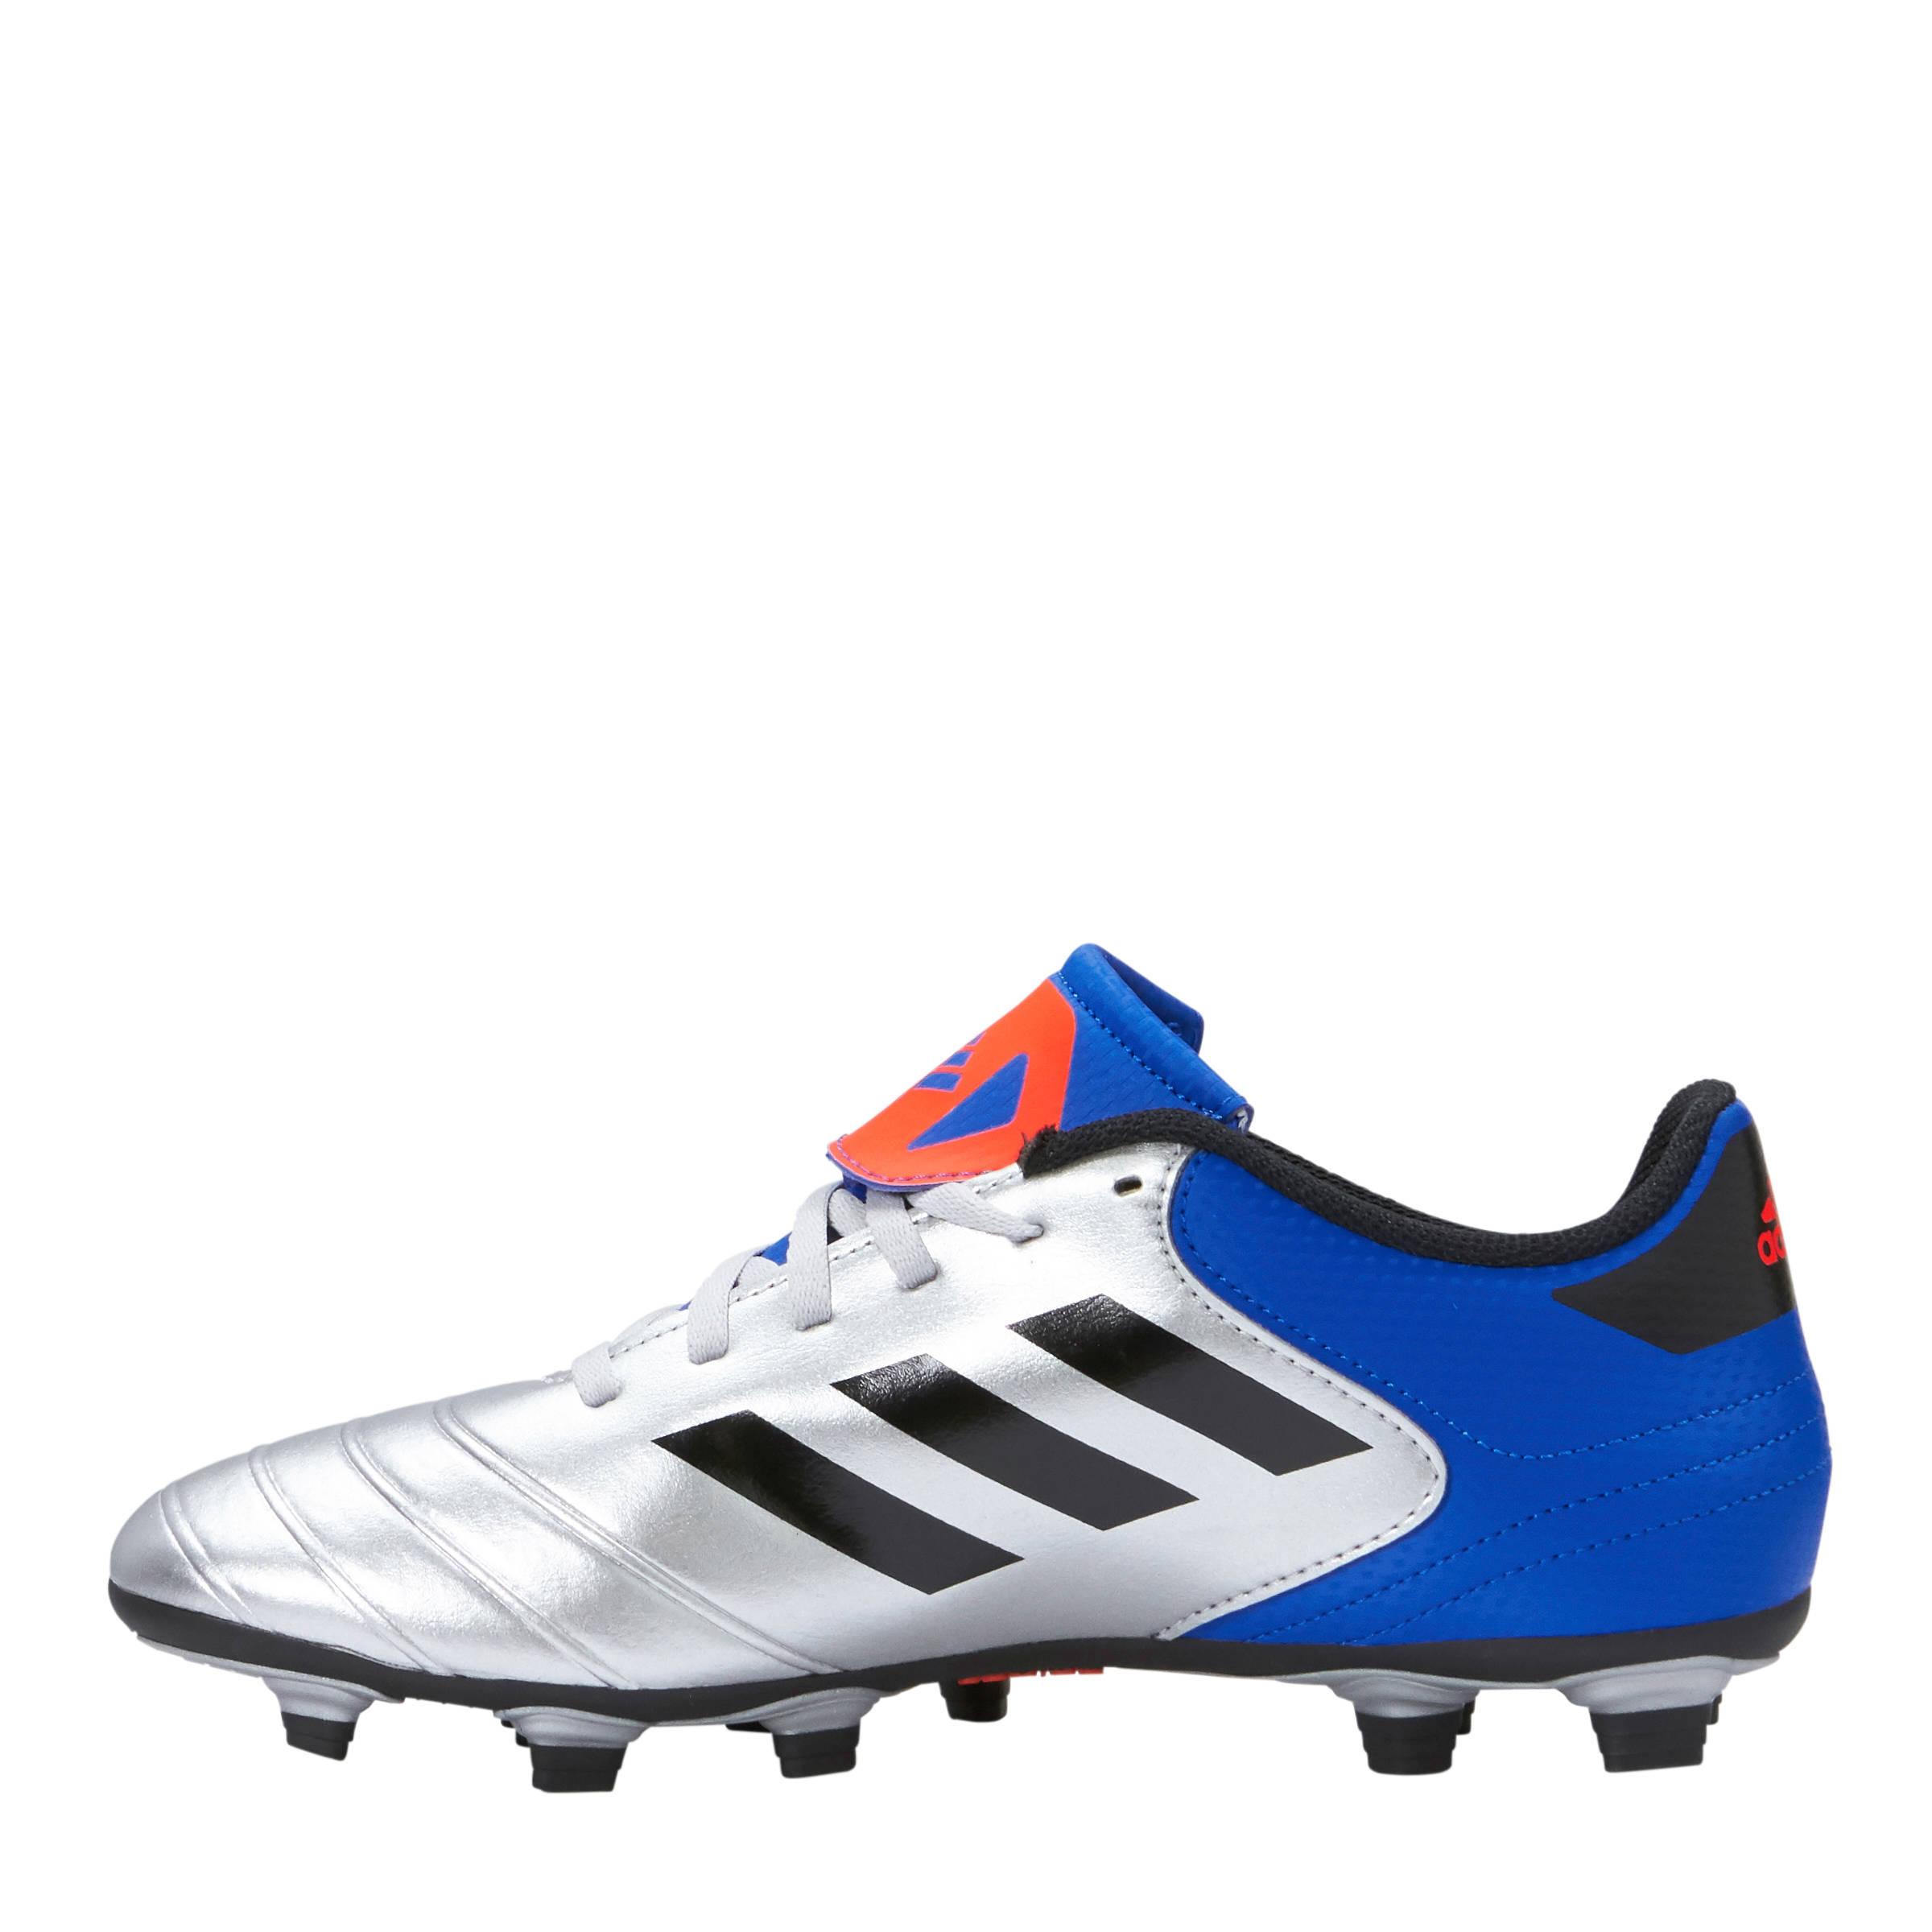 various colors 300b3 d2013 adidas performance Copa 18.4 FxG voetbalschoenen zilvergrijs